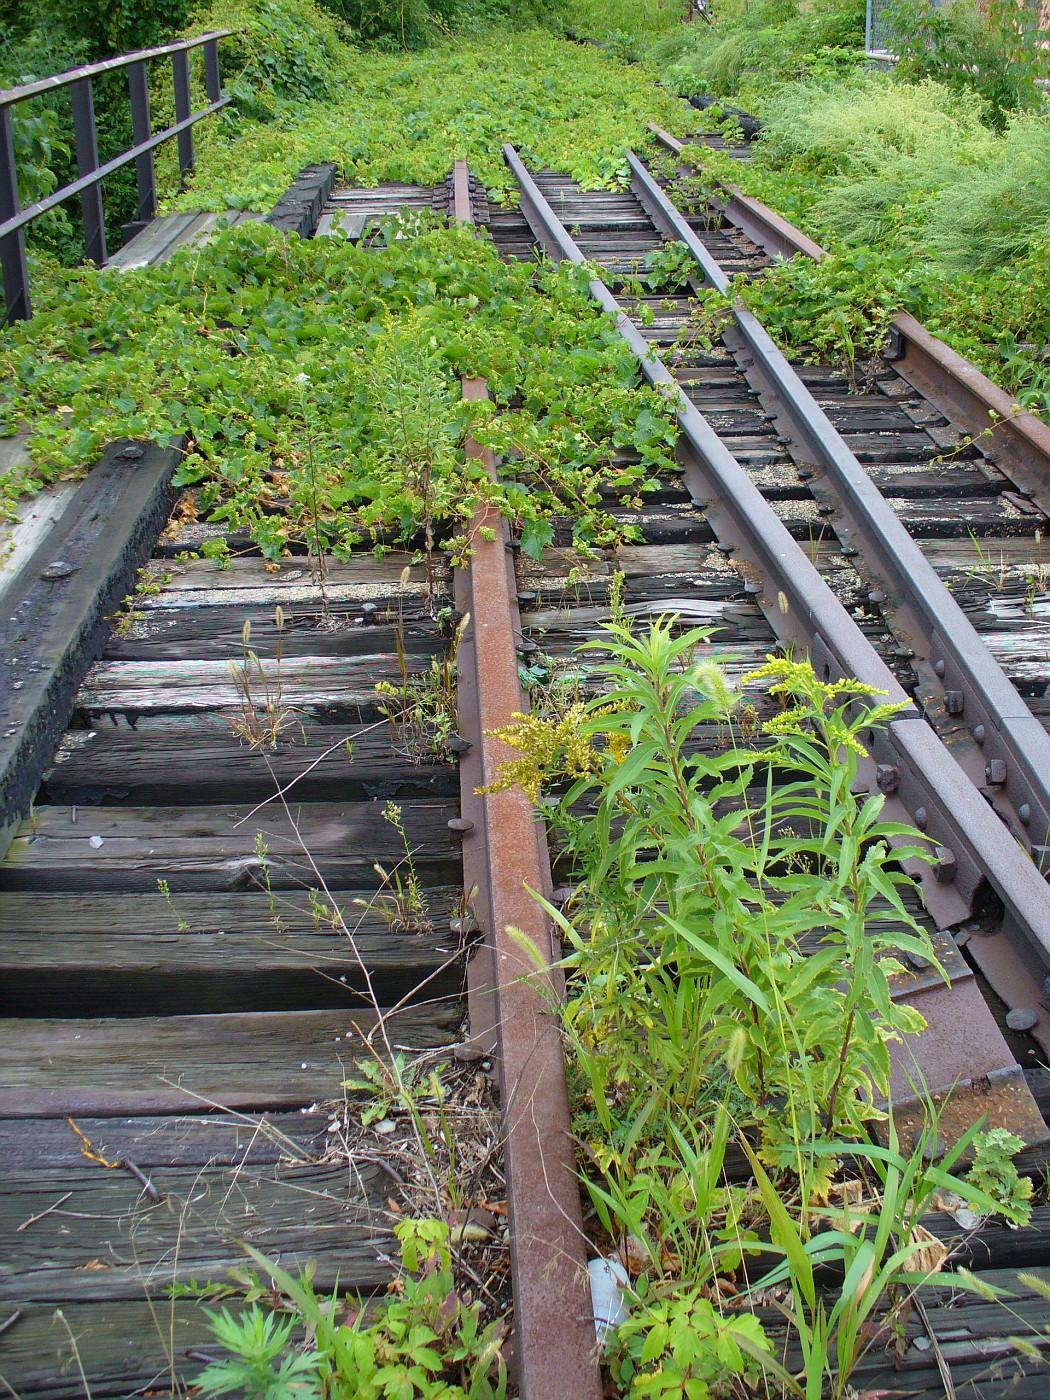 Tracks to nowhere - Дорога в никуда